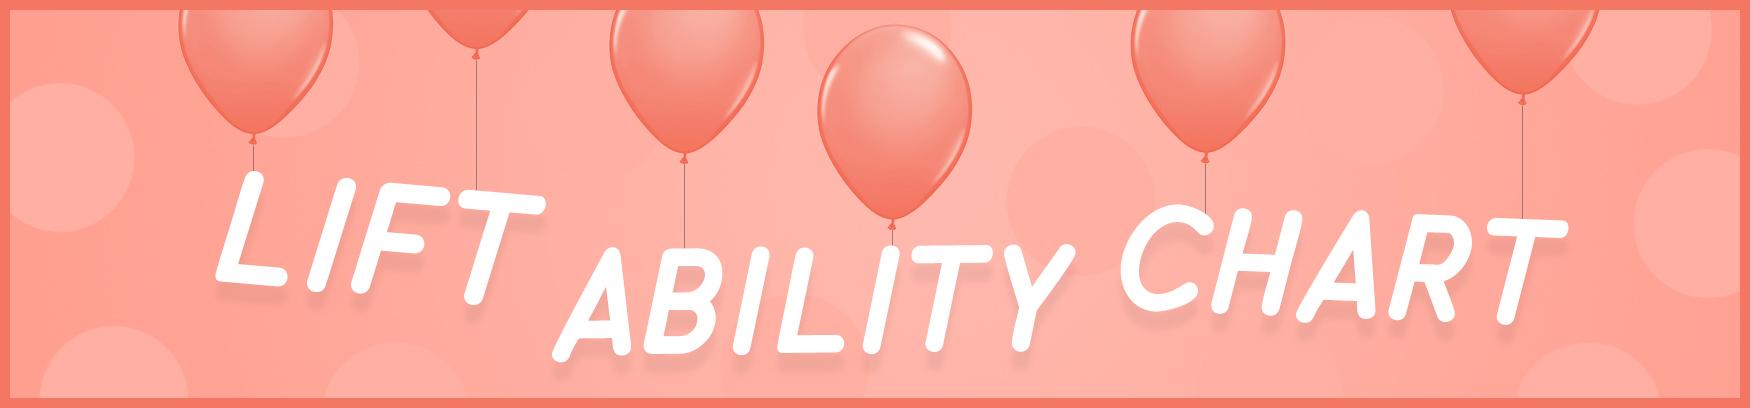 Lift Ability Chart image